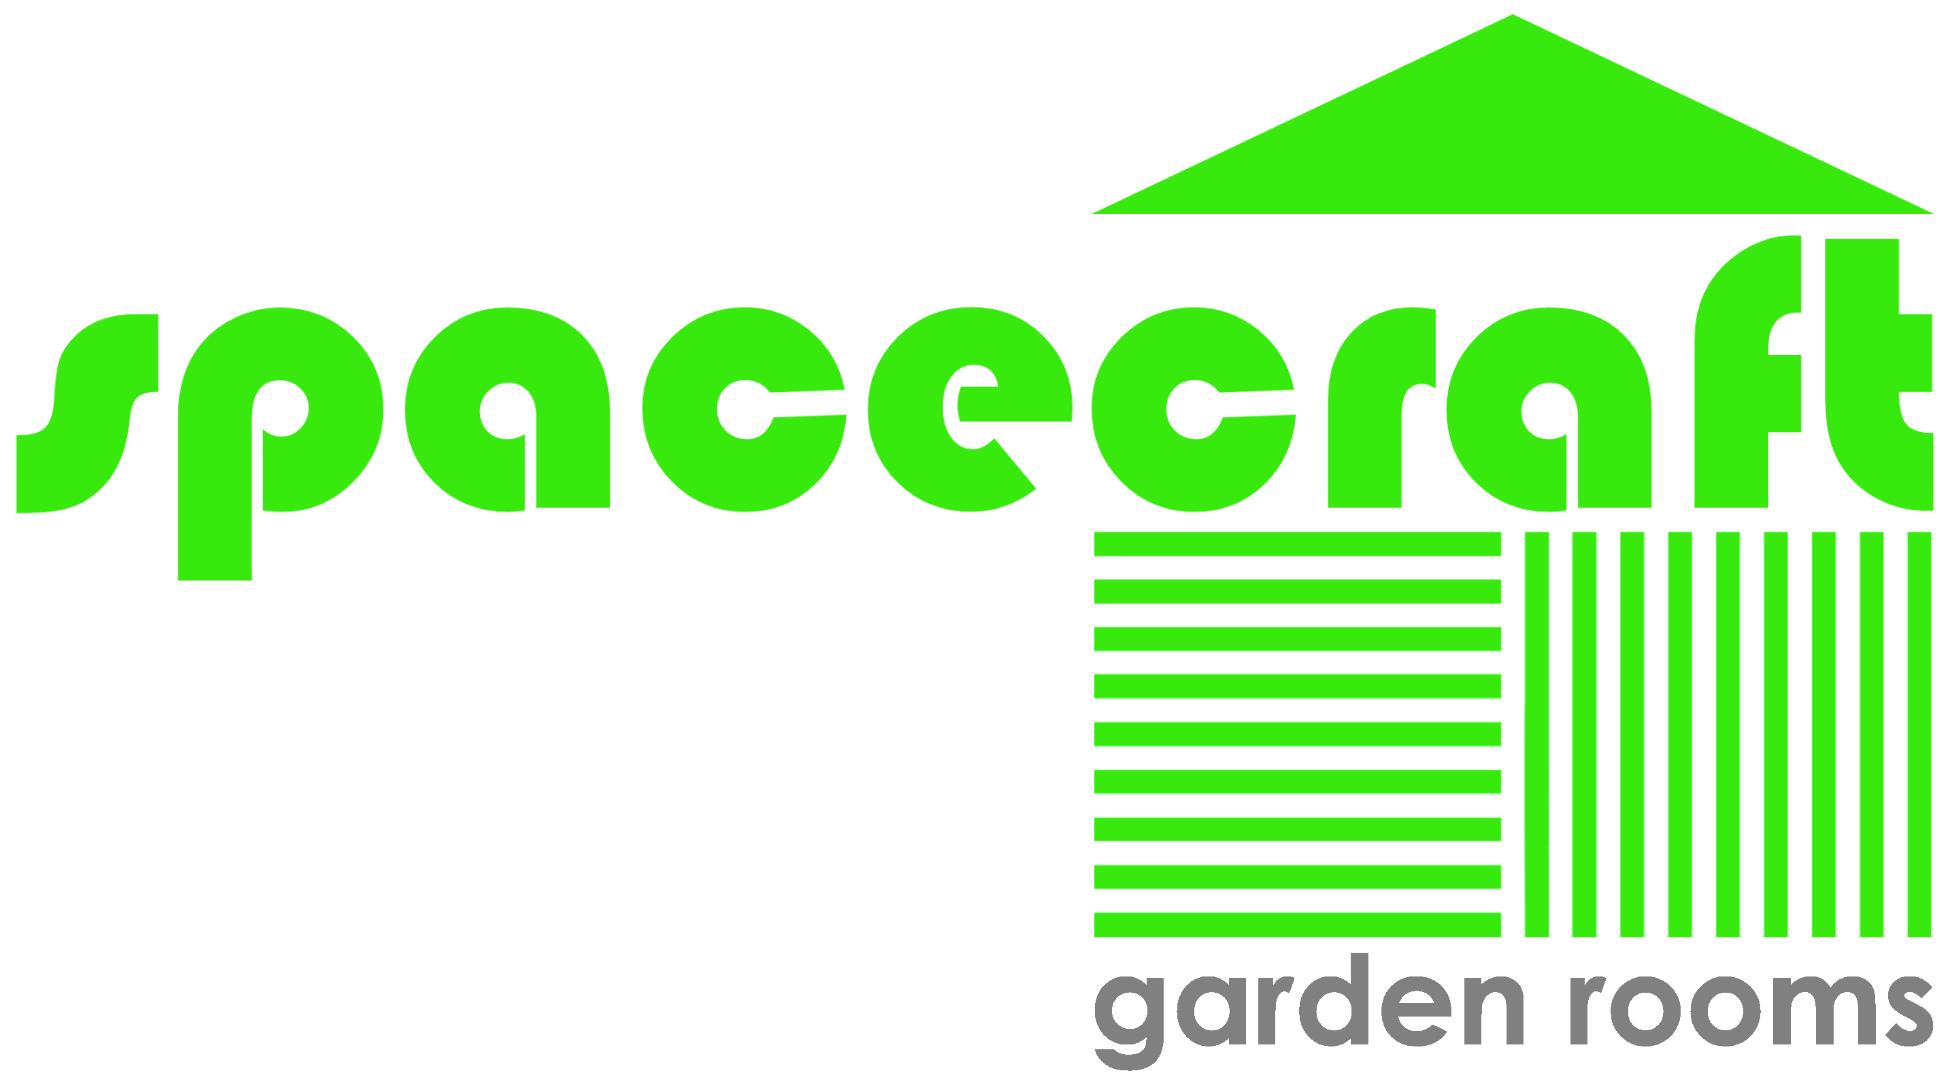 Spacecraft Garden Rooms Ltd